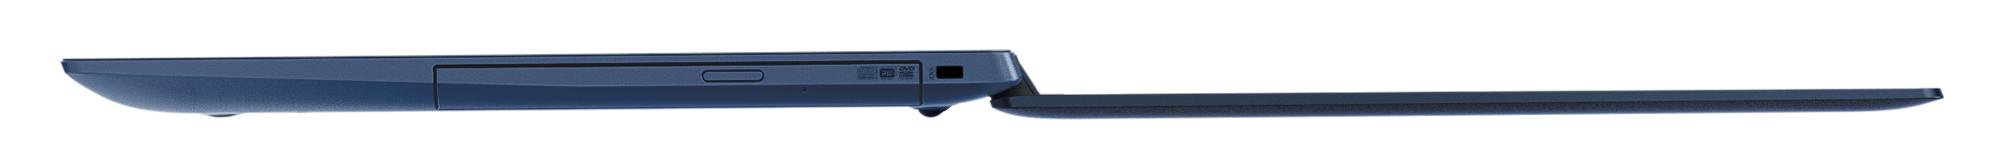 Фото  Ноутбук Lenovo ideapad 330-15 Midnight Blue (81DC010QRA)